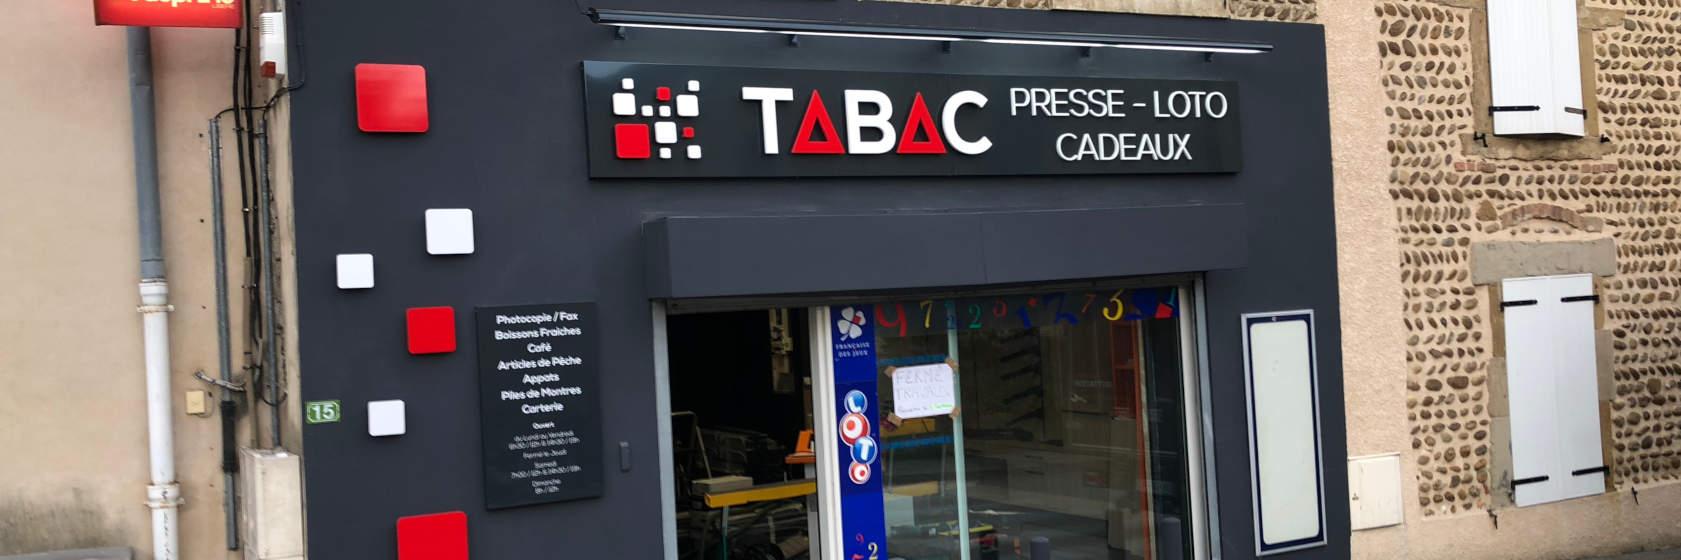 Tabac Presse Saint Sorlin en Valloire (26)